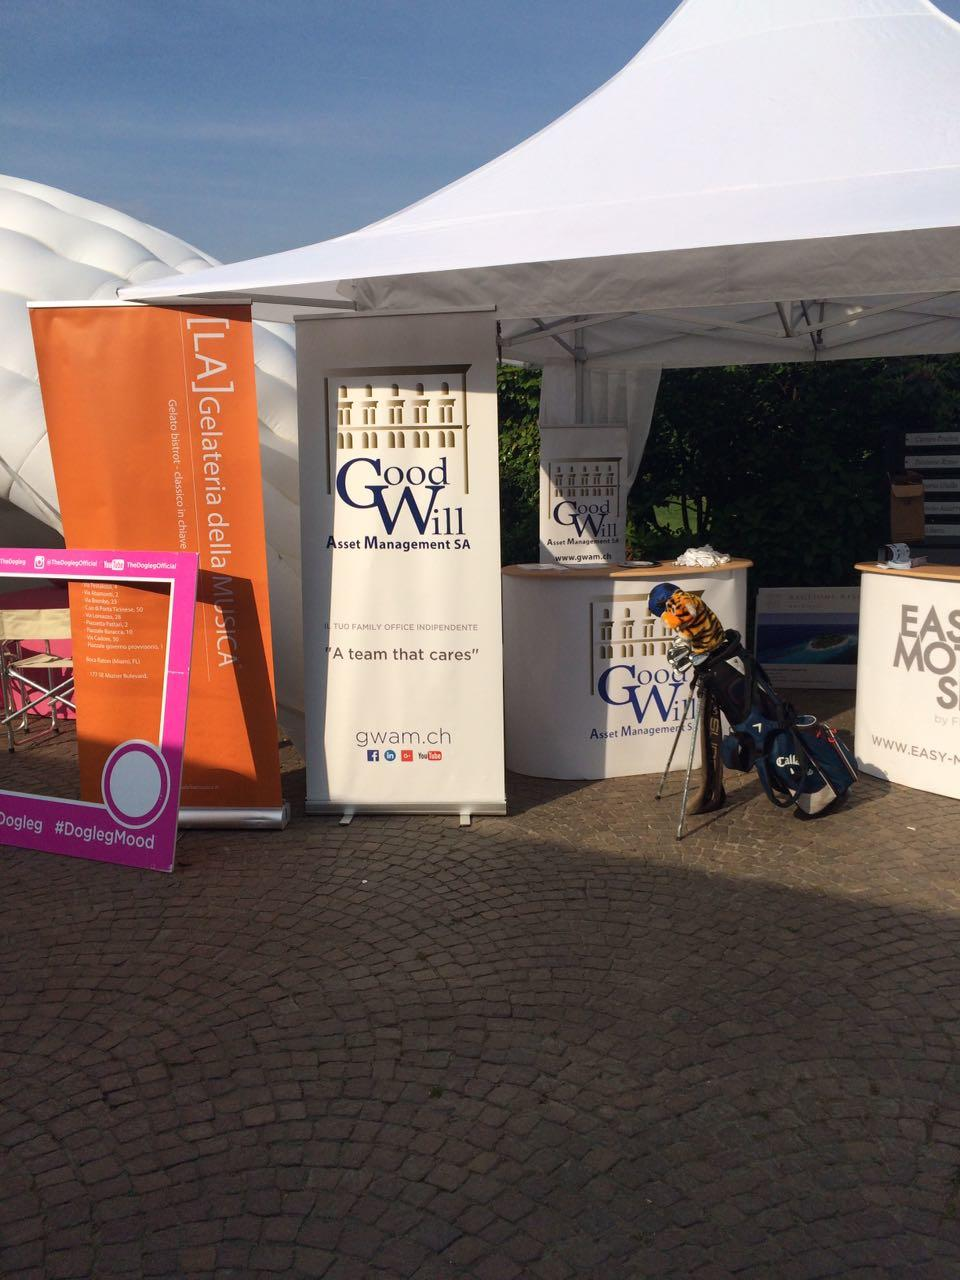 EVENTI IN CANTON TICINO 47  Goodwill Asset Management SA